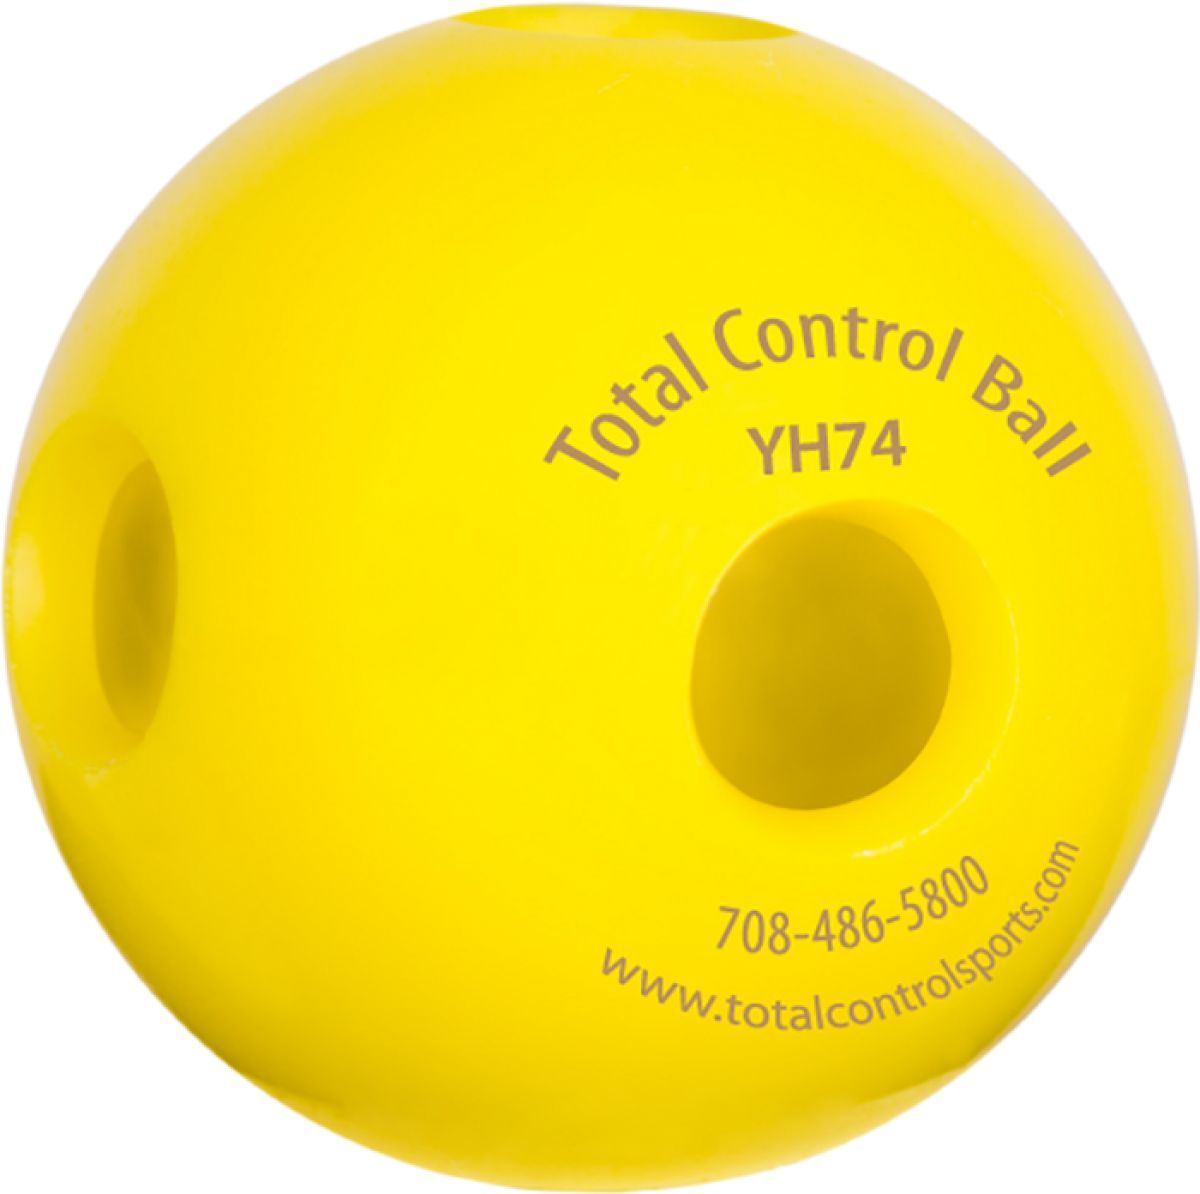 Total Control 2.9